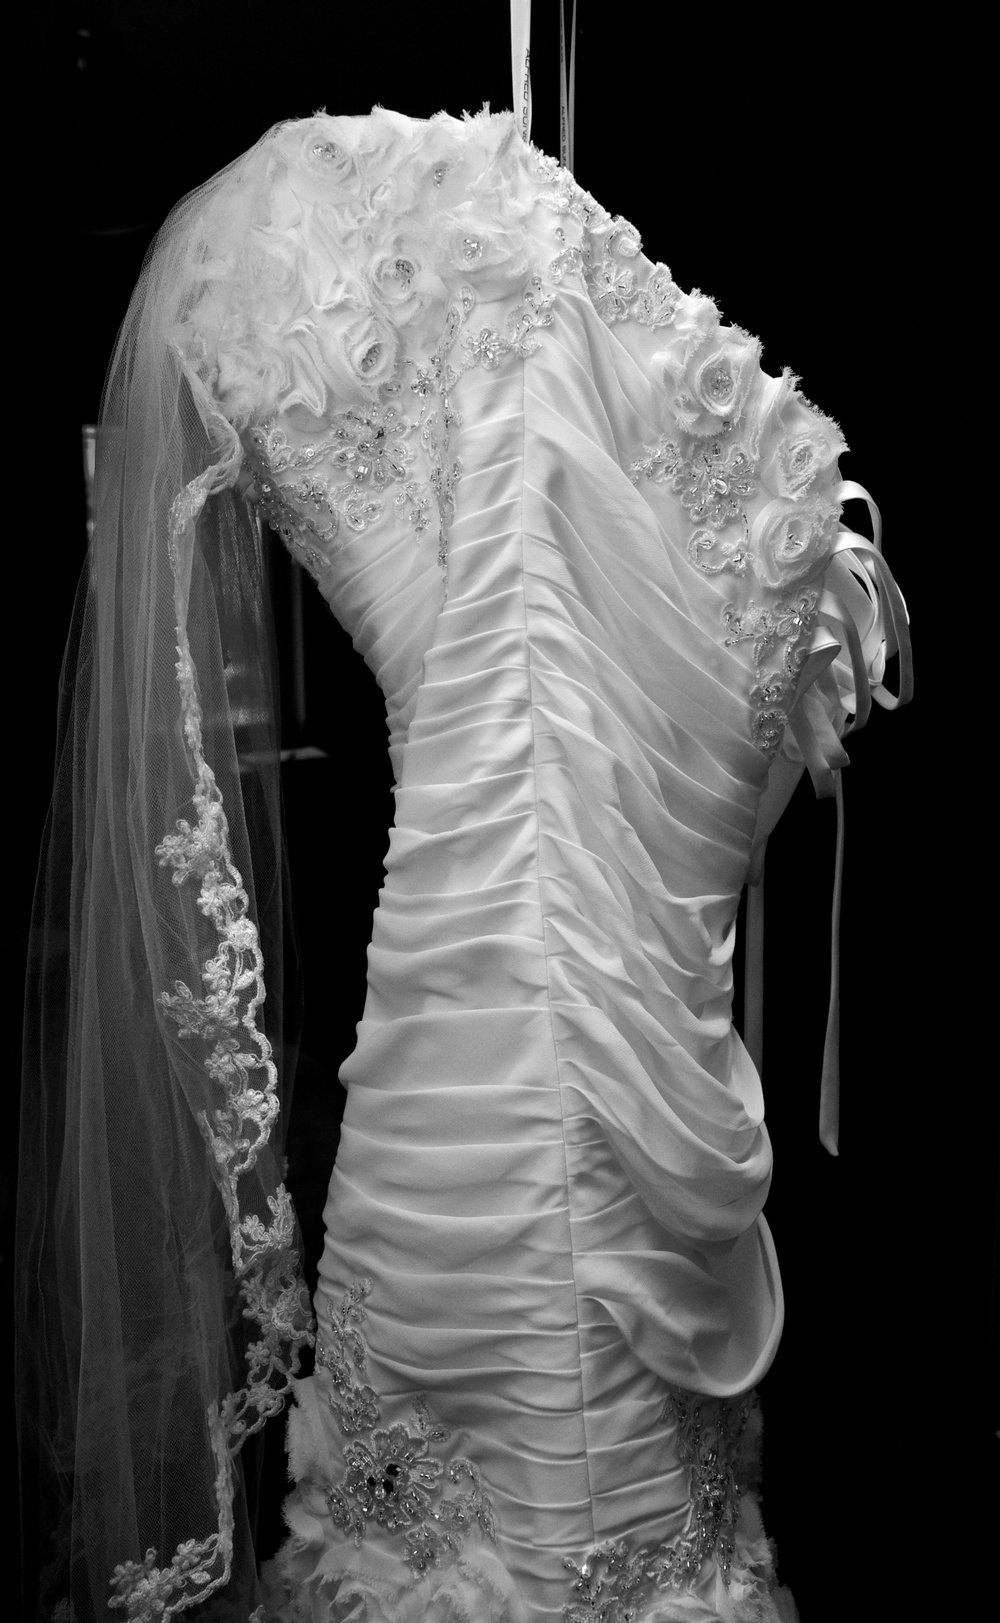 2013-11-09 at 07-17-20 Black & White, Curves, Dress, Lace, Veil, Wedding.jpg